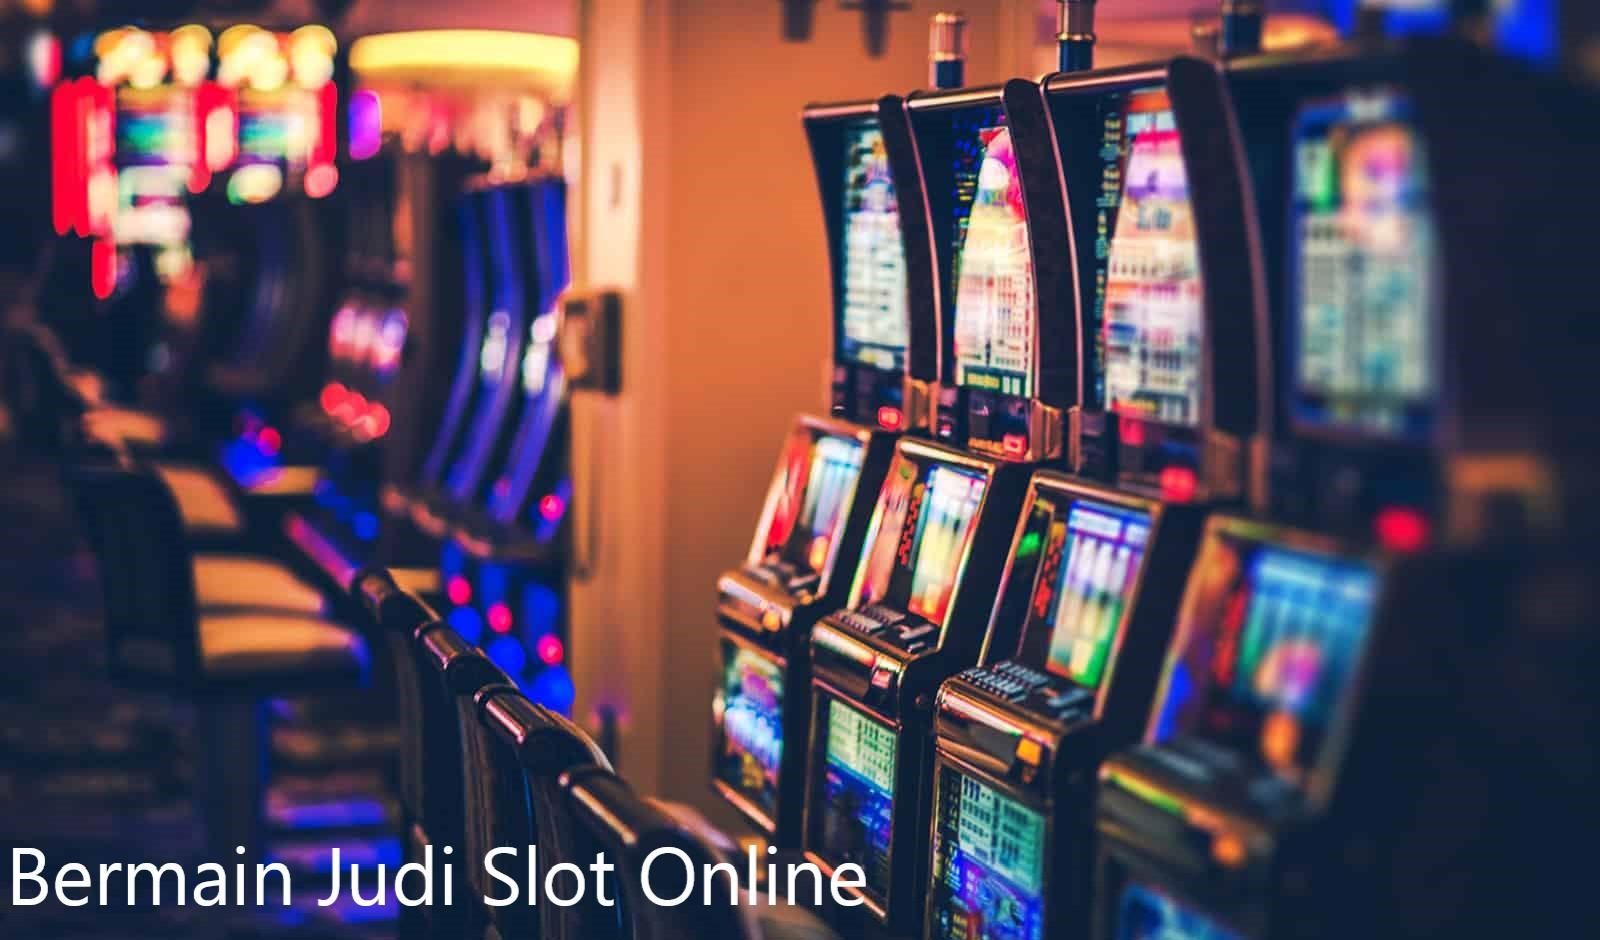 Bermain Permainan Judi Online